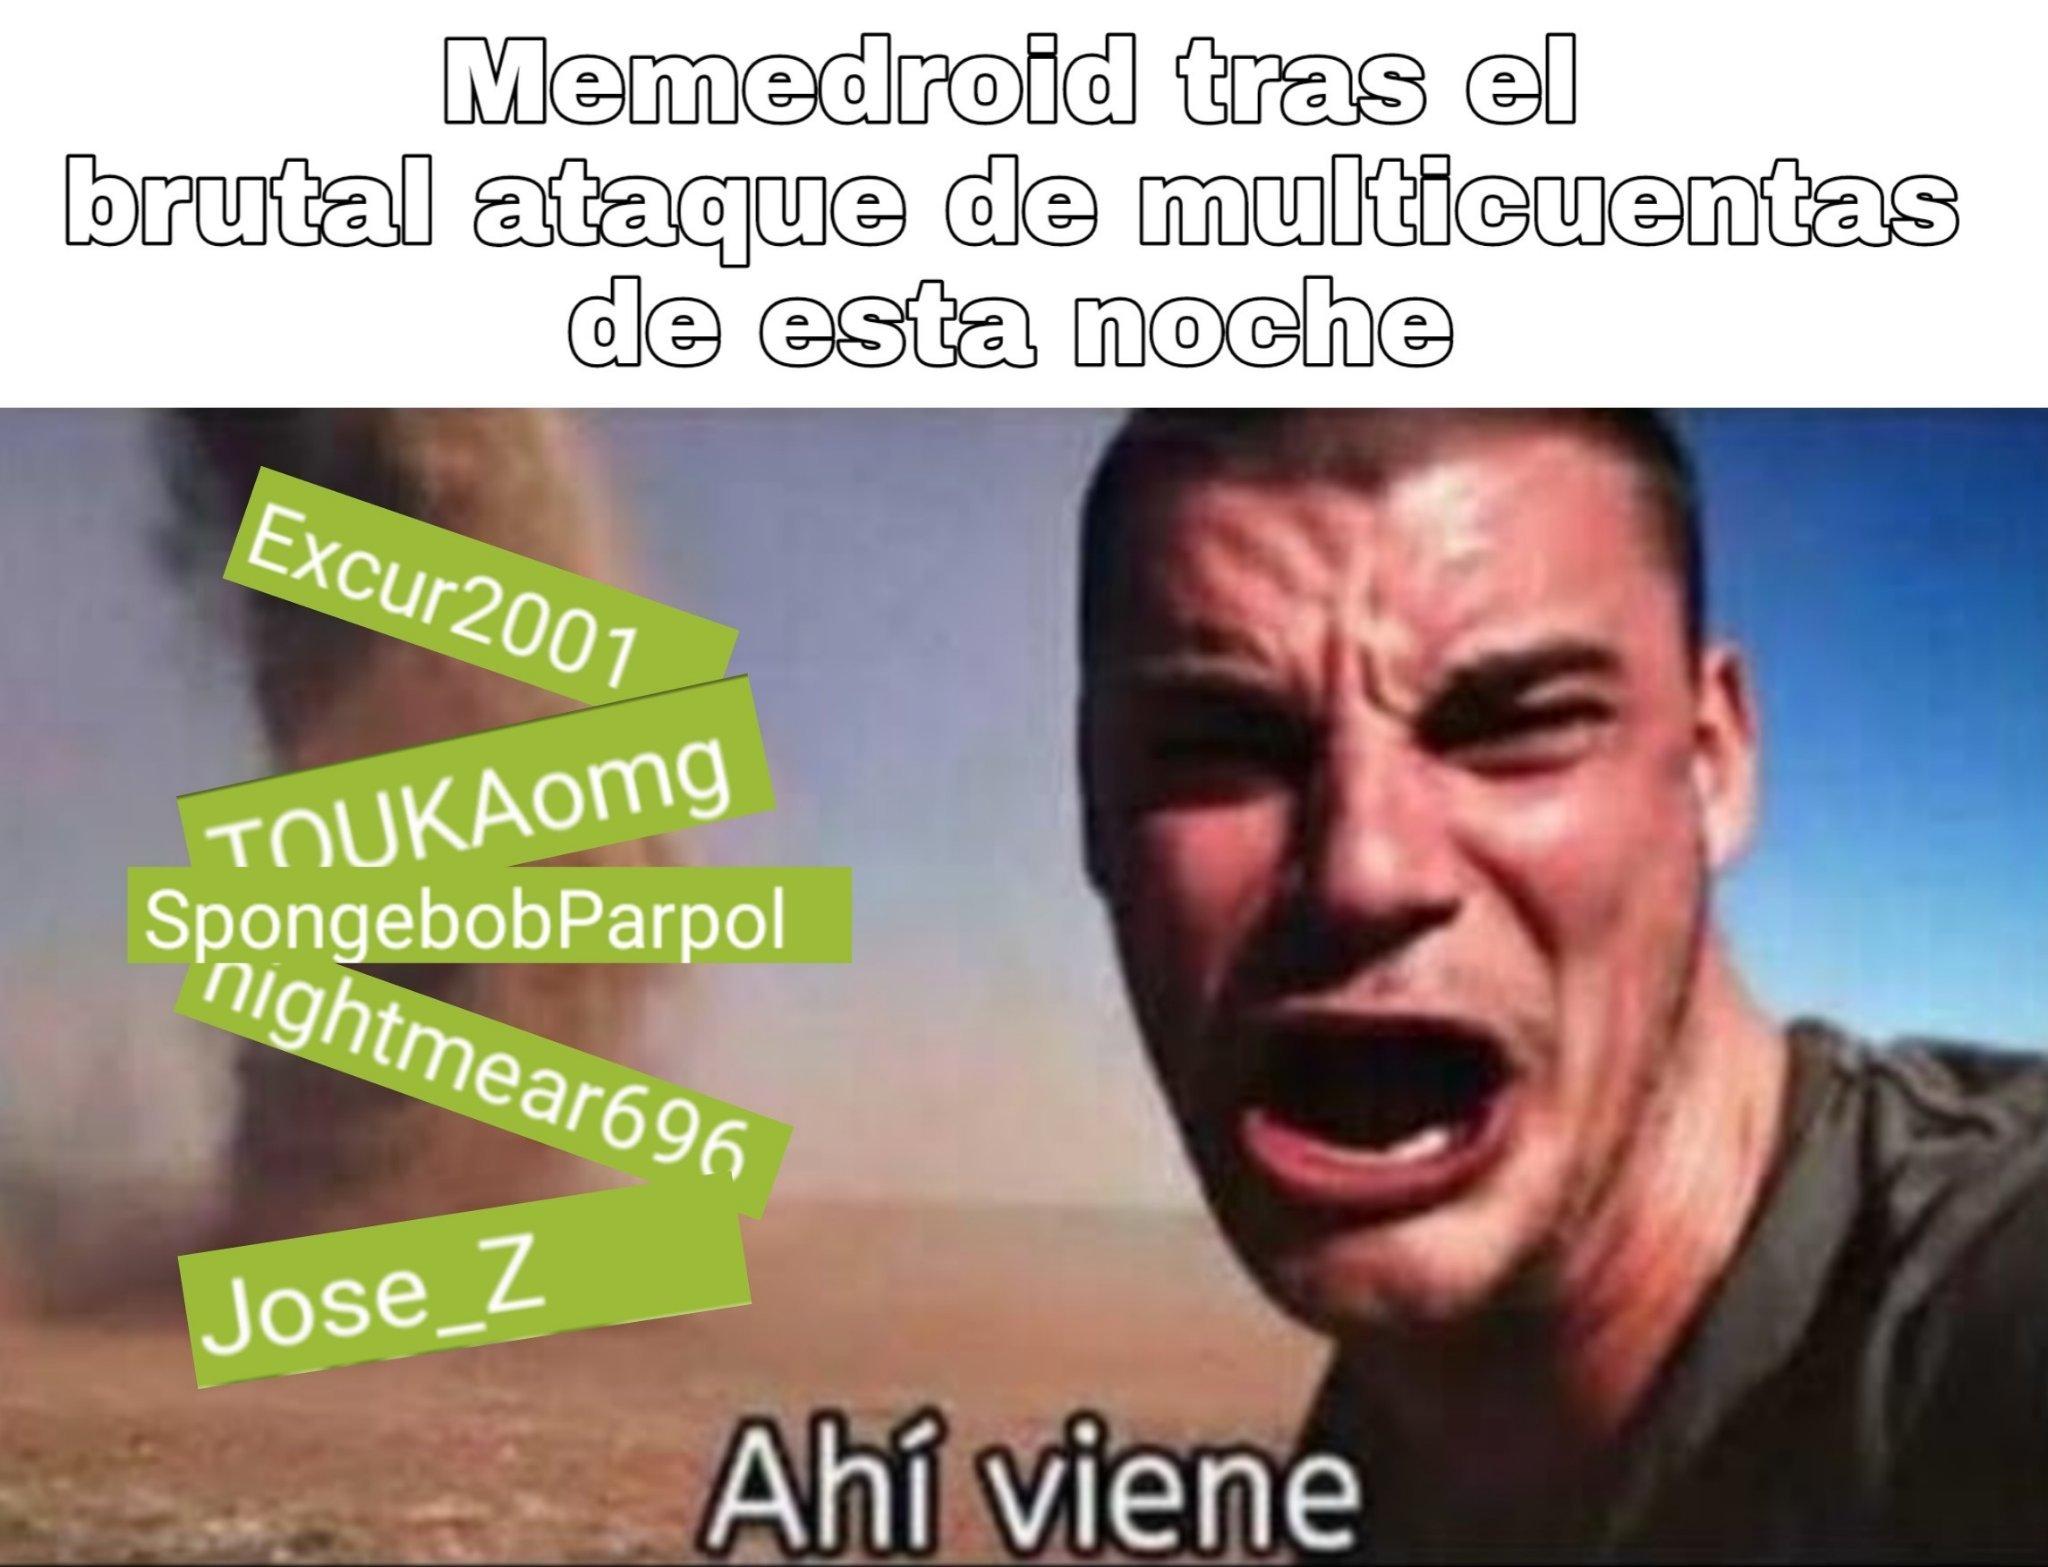 Muerte a los multicuentas - meme